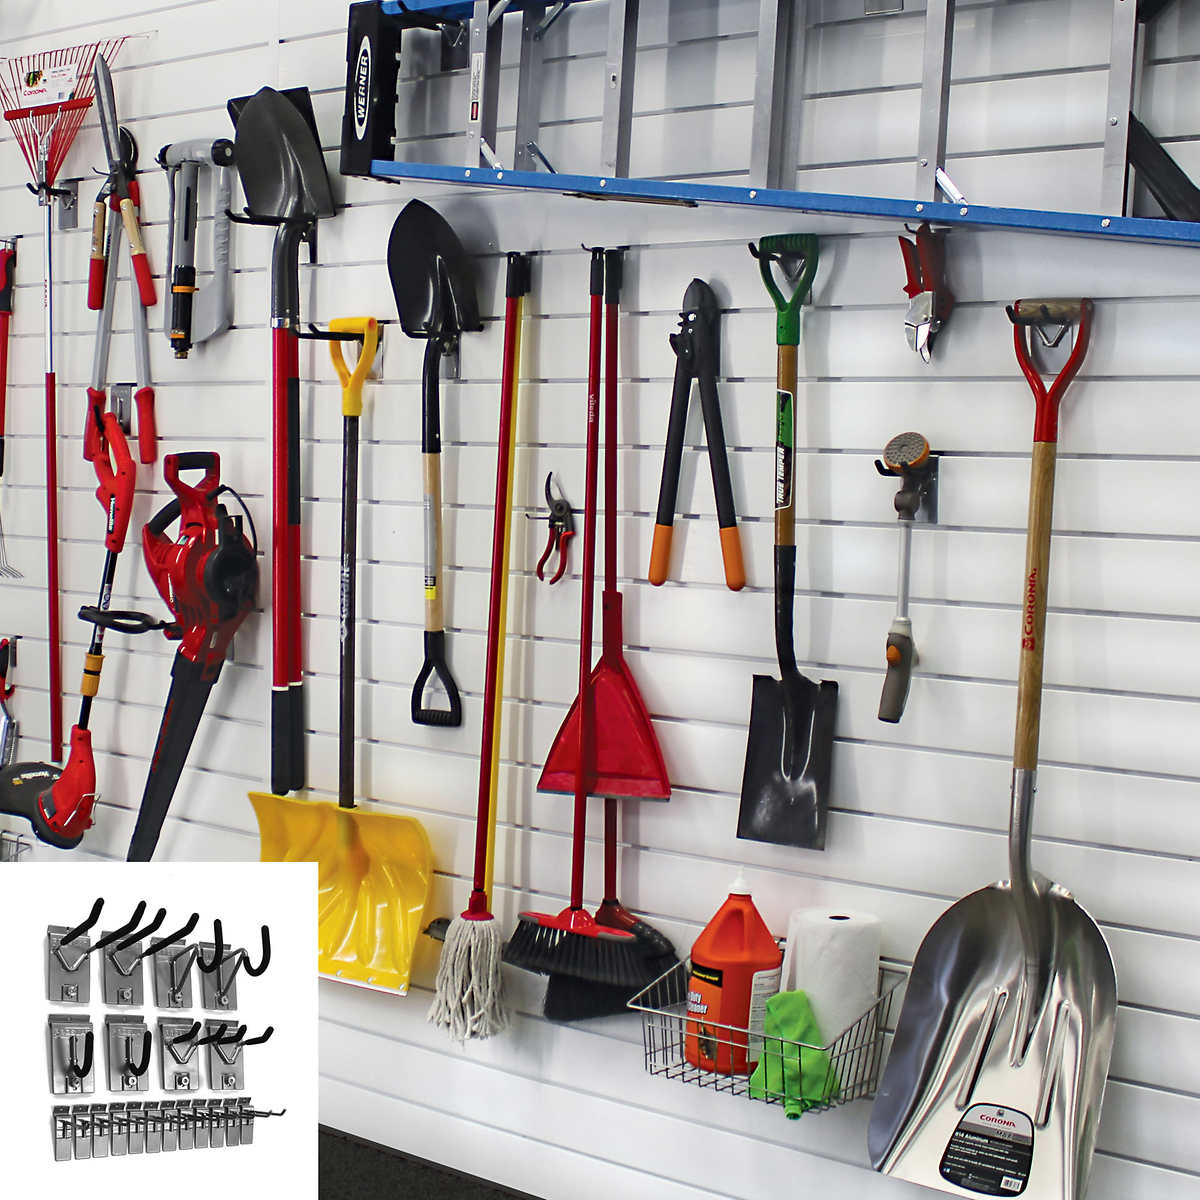 Proslat 8' Panel Set and 20-piece Hook Kit Bundle - Garage Storage Racks Costco